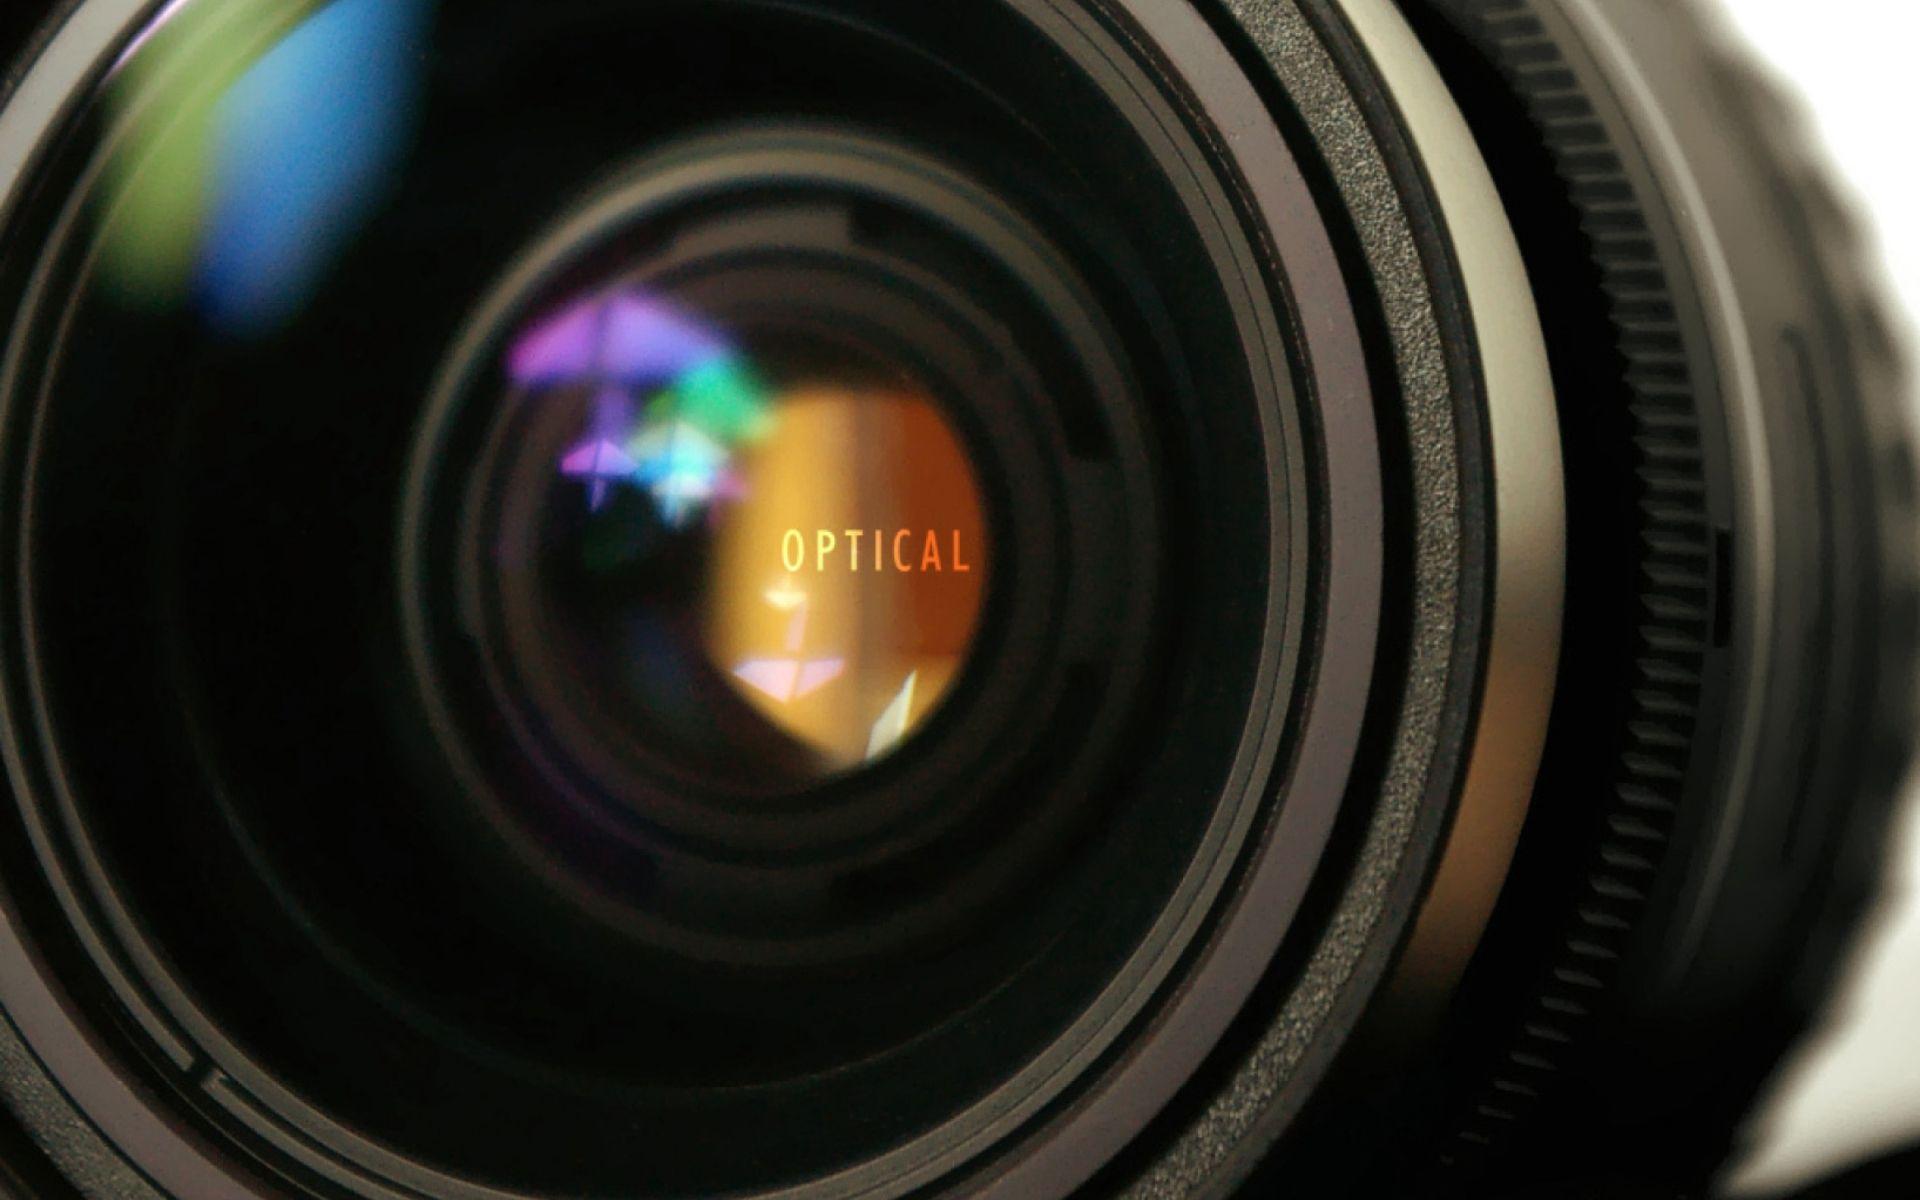 Lens Wallpapers for Widescreen Desktop PC 1920x1080 Full HD